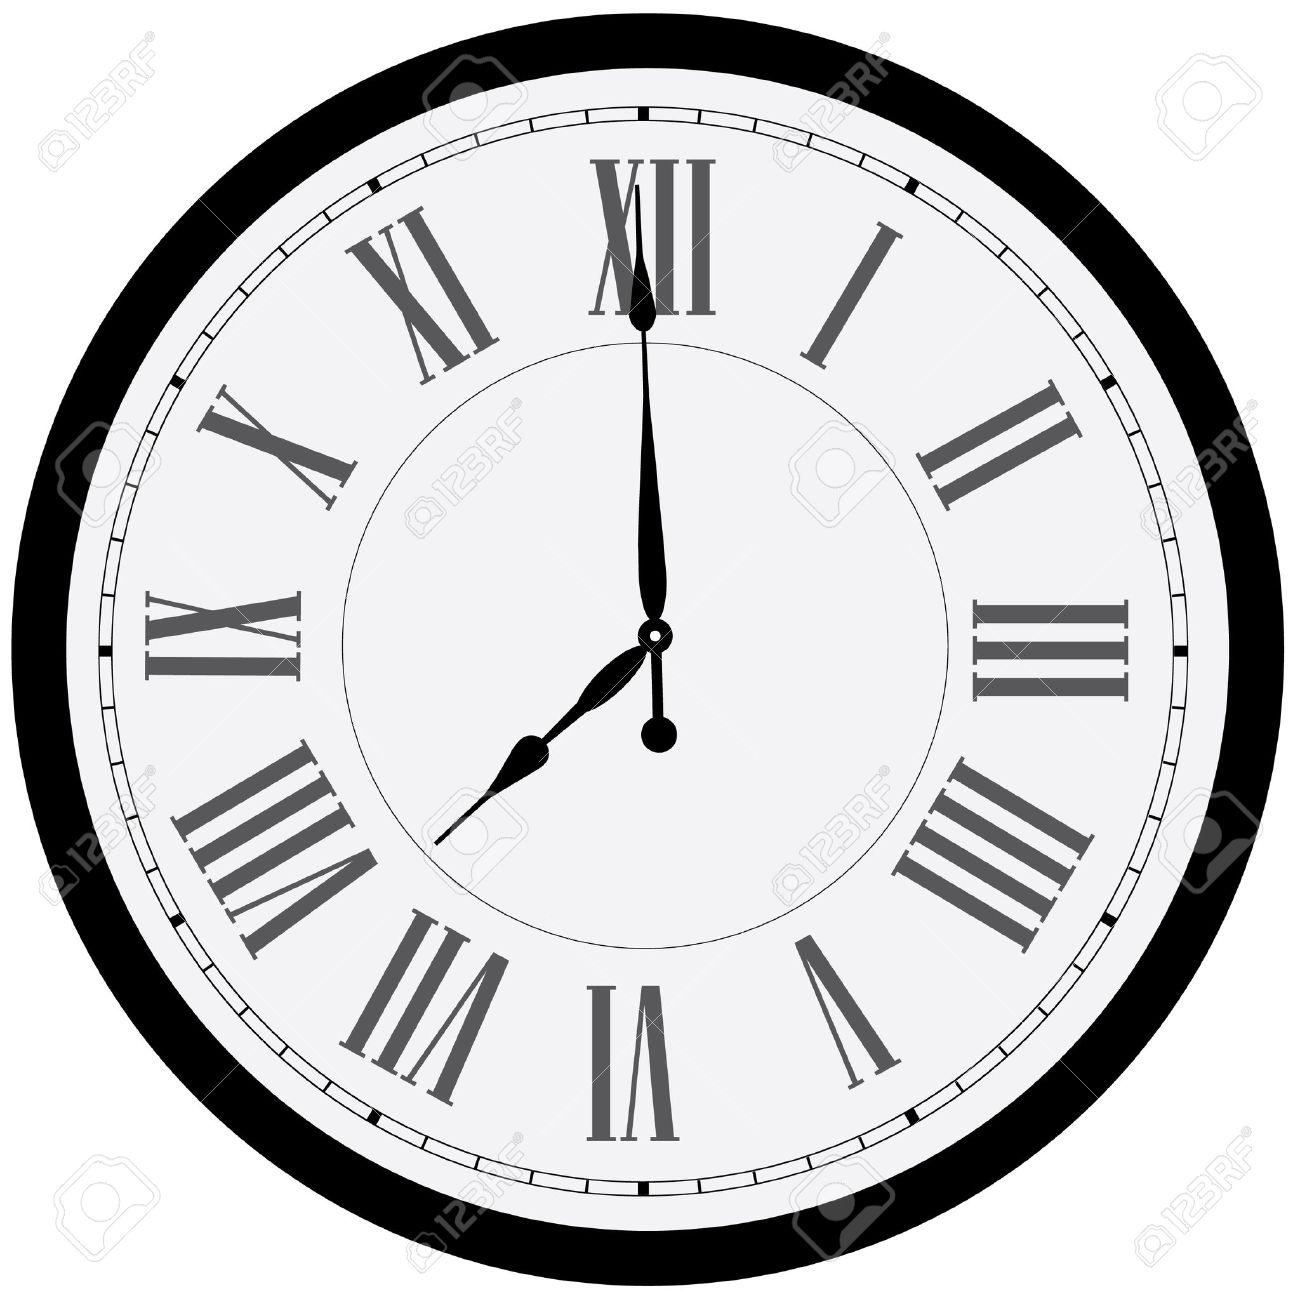 Black wall clock raster isolated. Clock on wall shows eight o'clock. Roman numeral clock - 47517338